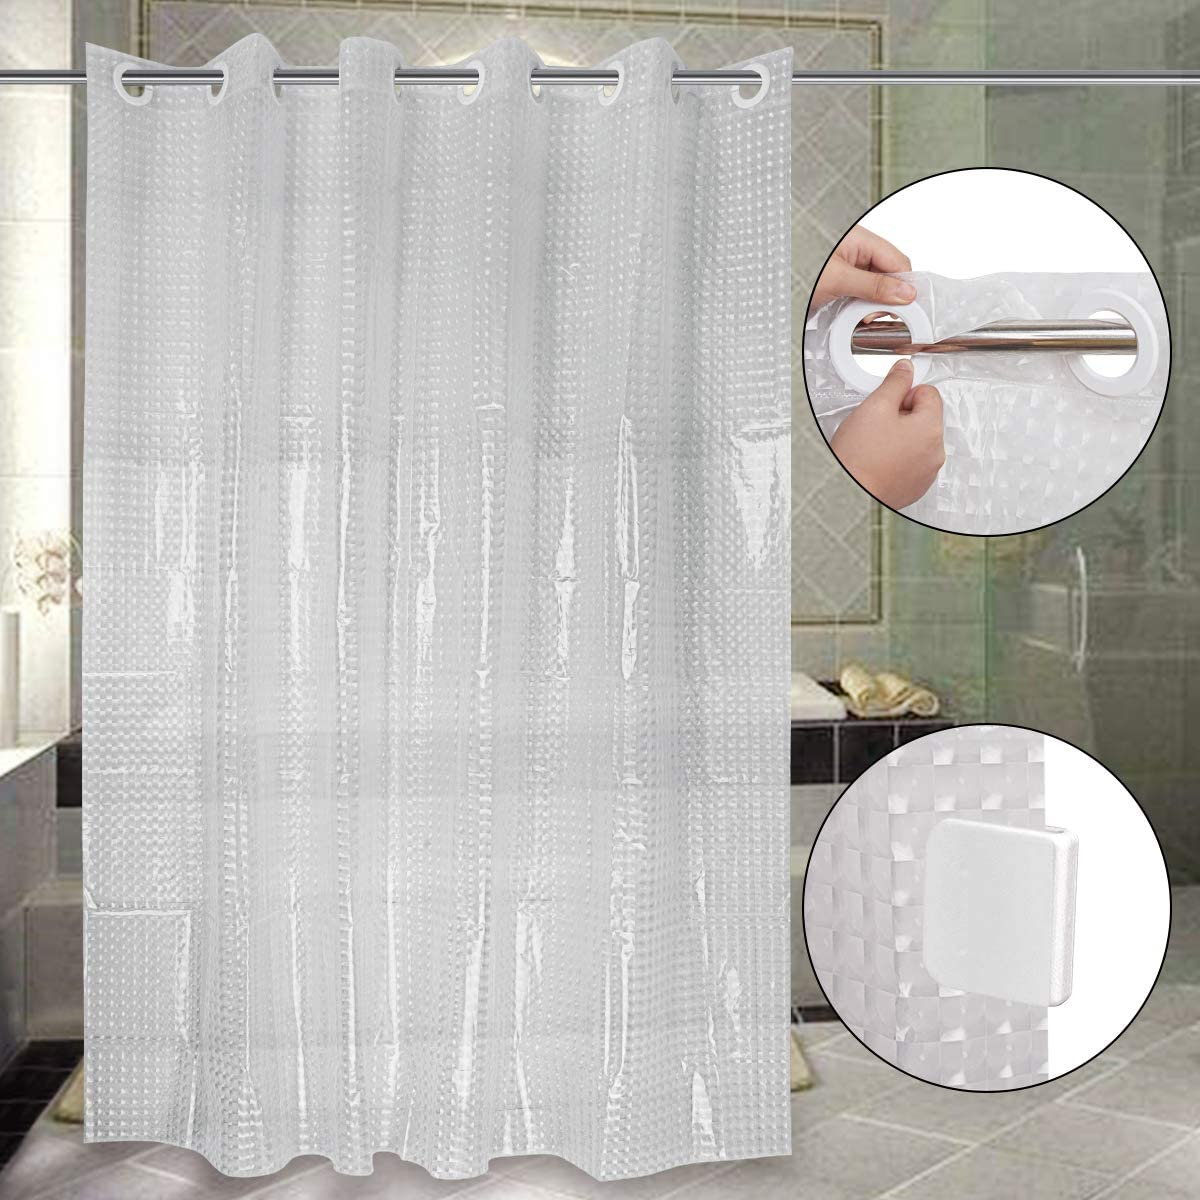 "Top Quality 70.87"" PEVA Waterproof Mildew Resistant Bath Shower Curtain w//Hooks"